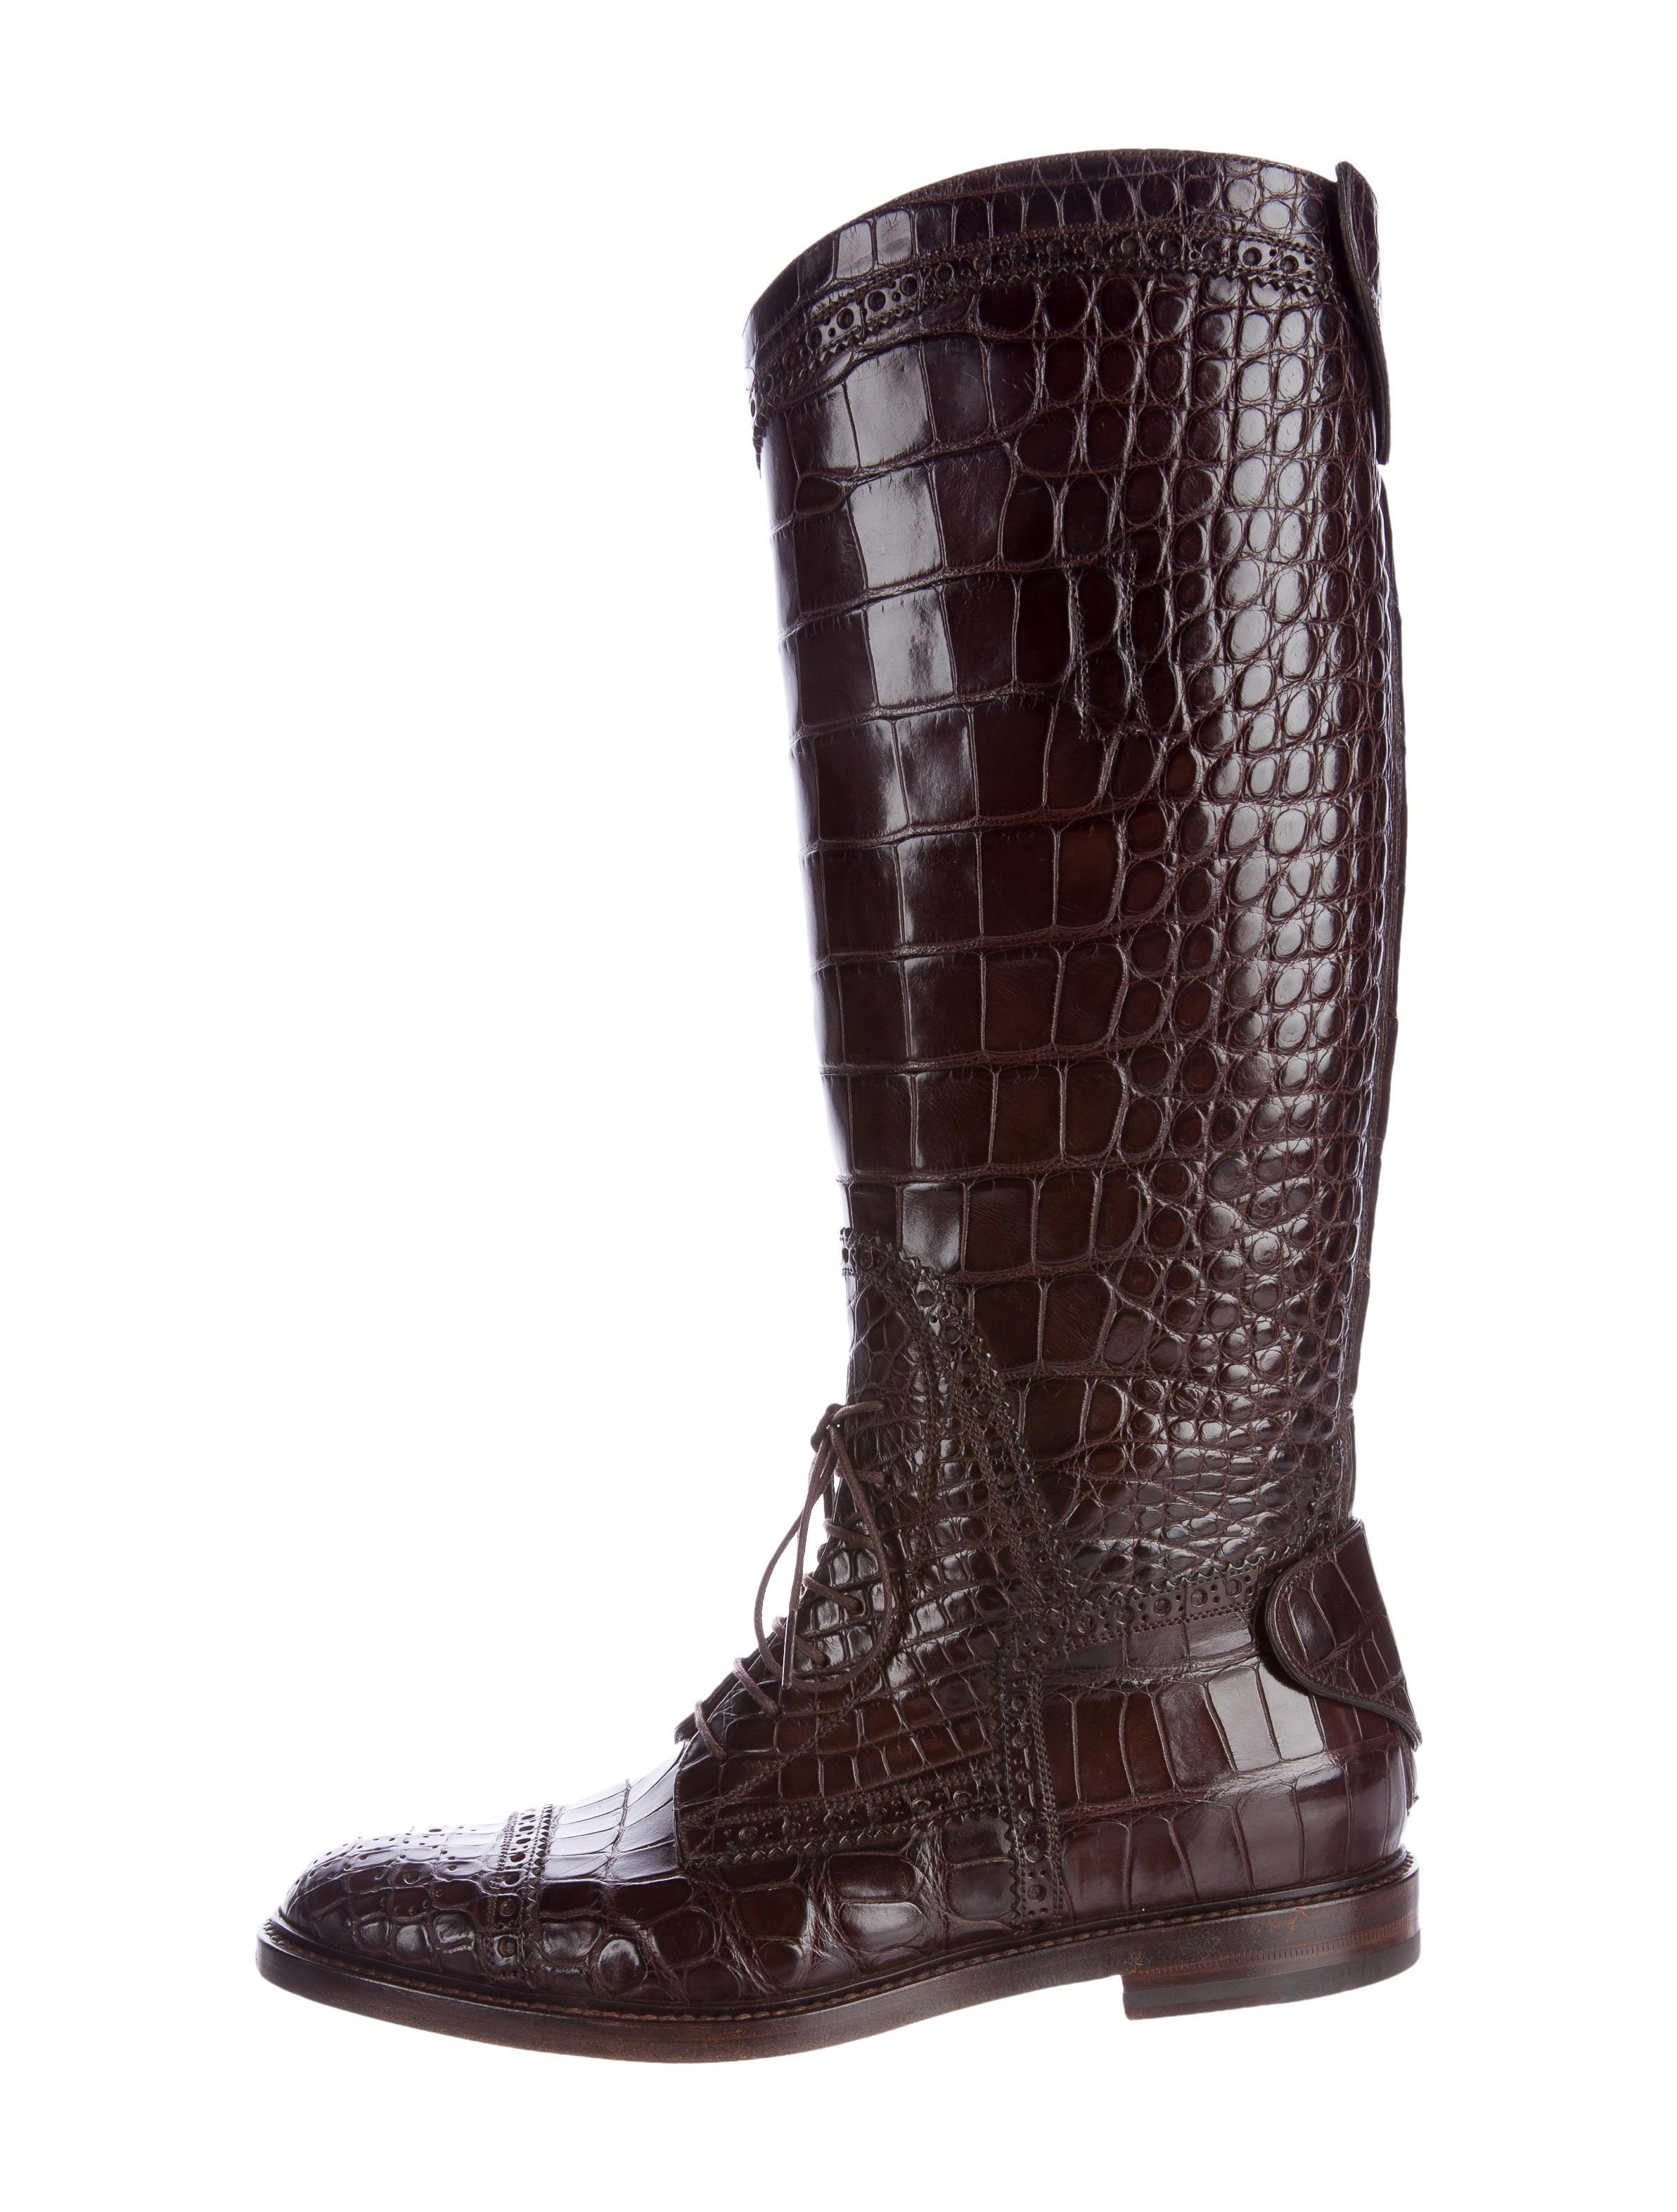 c7966eaabc4 Gucci Crocodile Knee-High Boots - Shoes - GUC110463